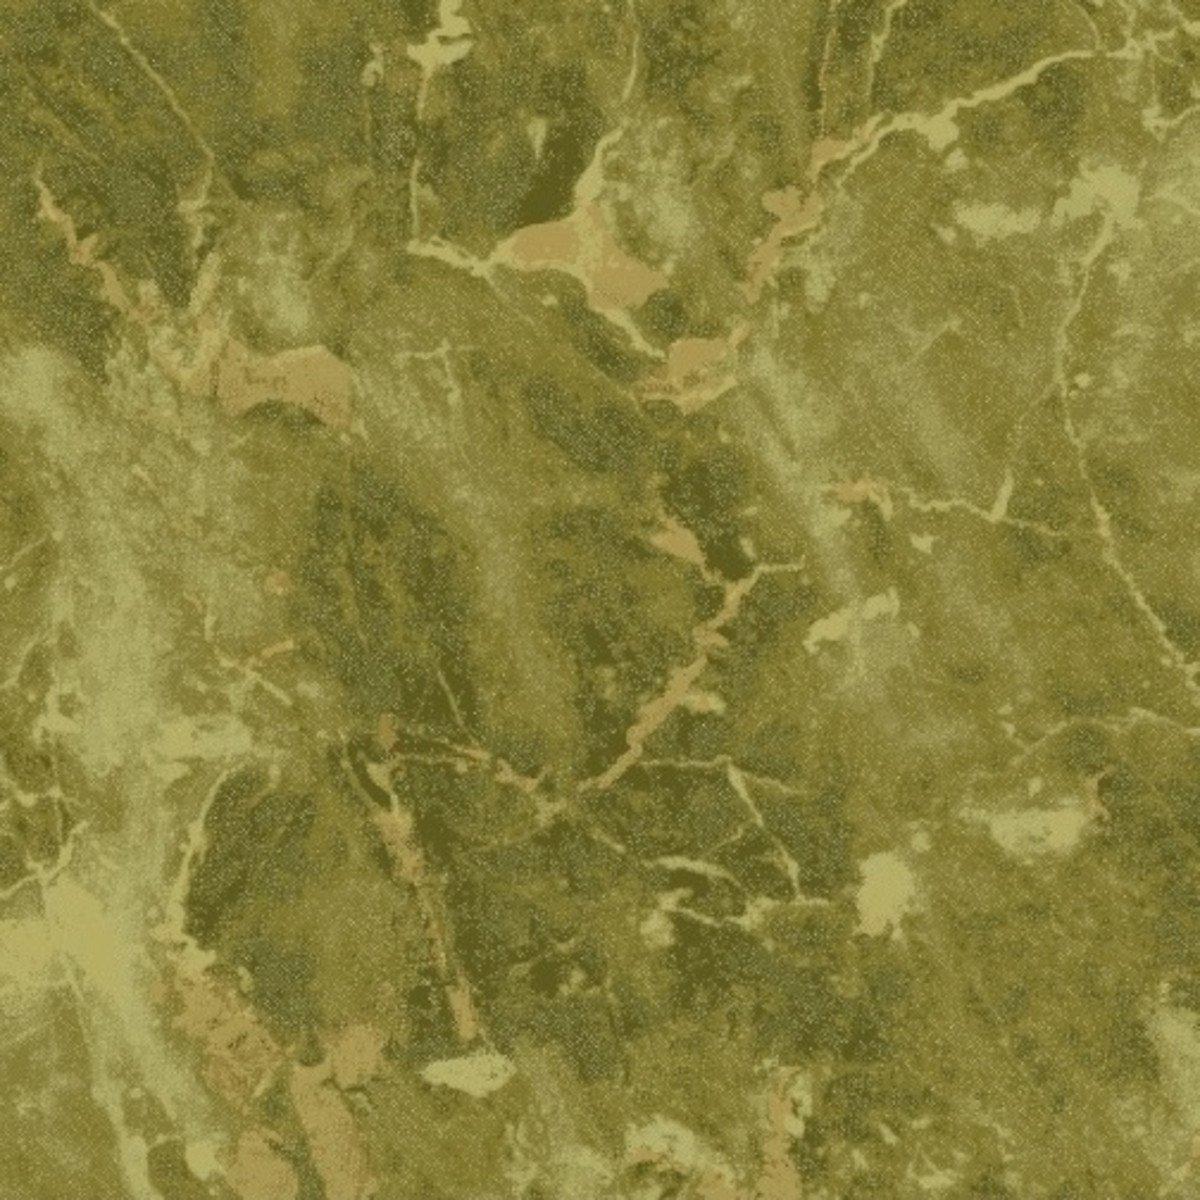 Marcus  Fabrics - Just Mined - Faye Burgos - R14 8336 0114